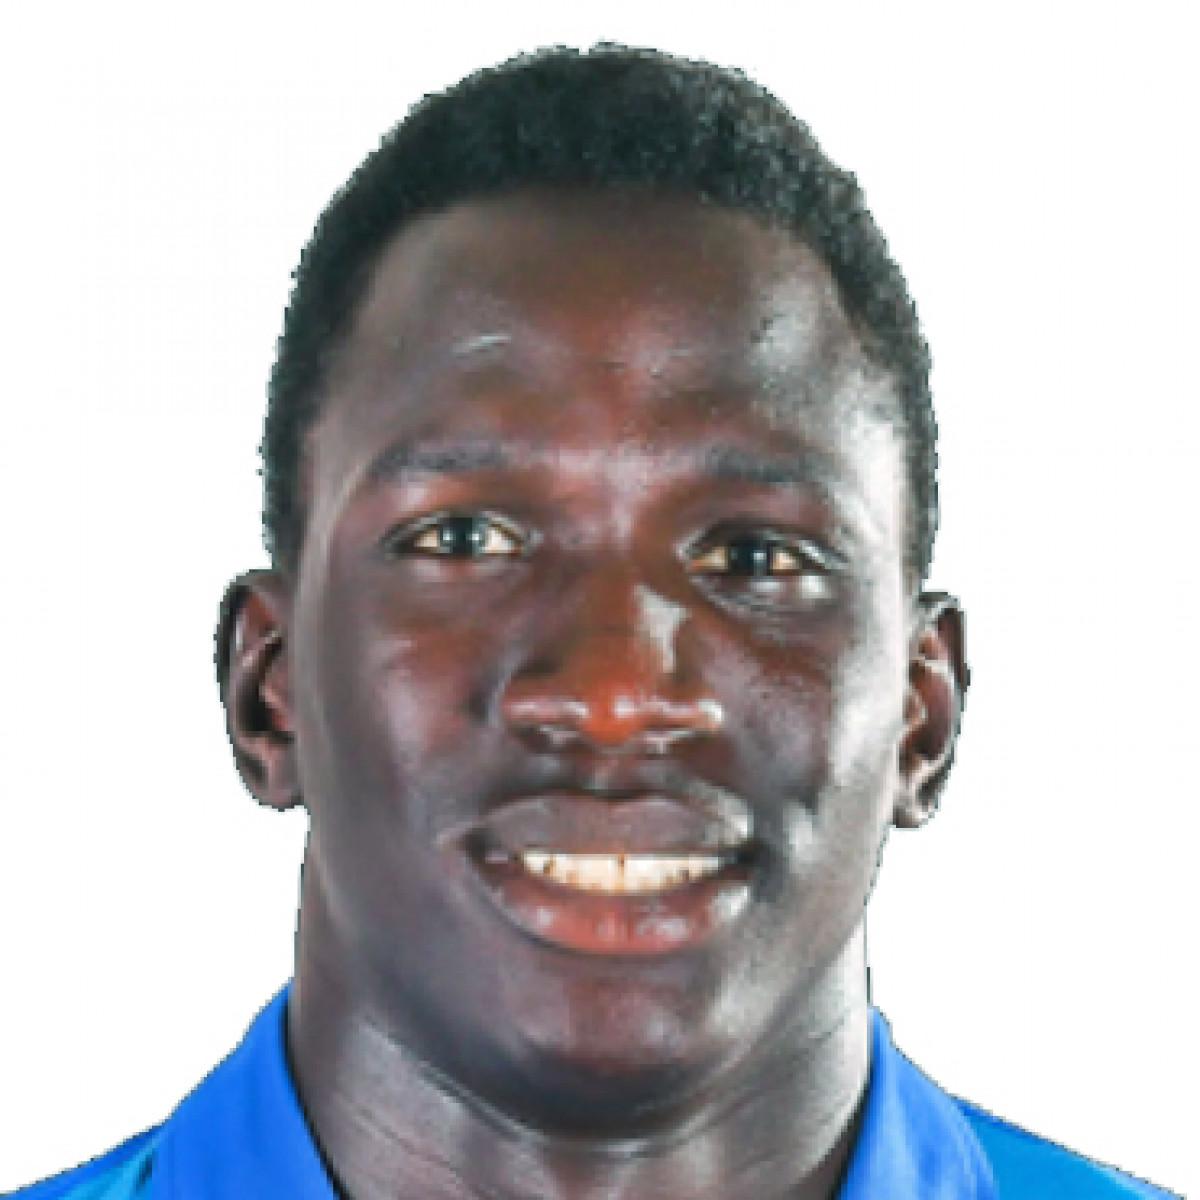 Ousmane Diop